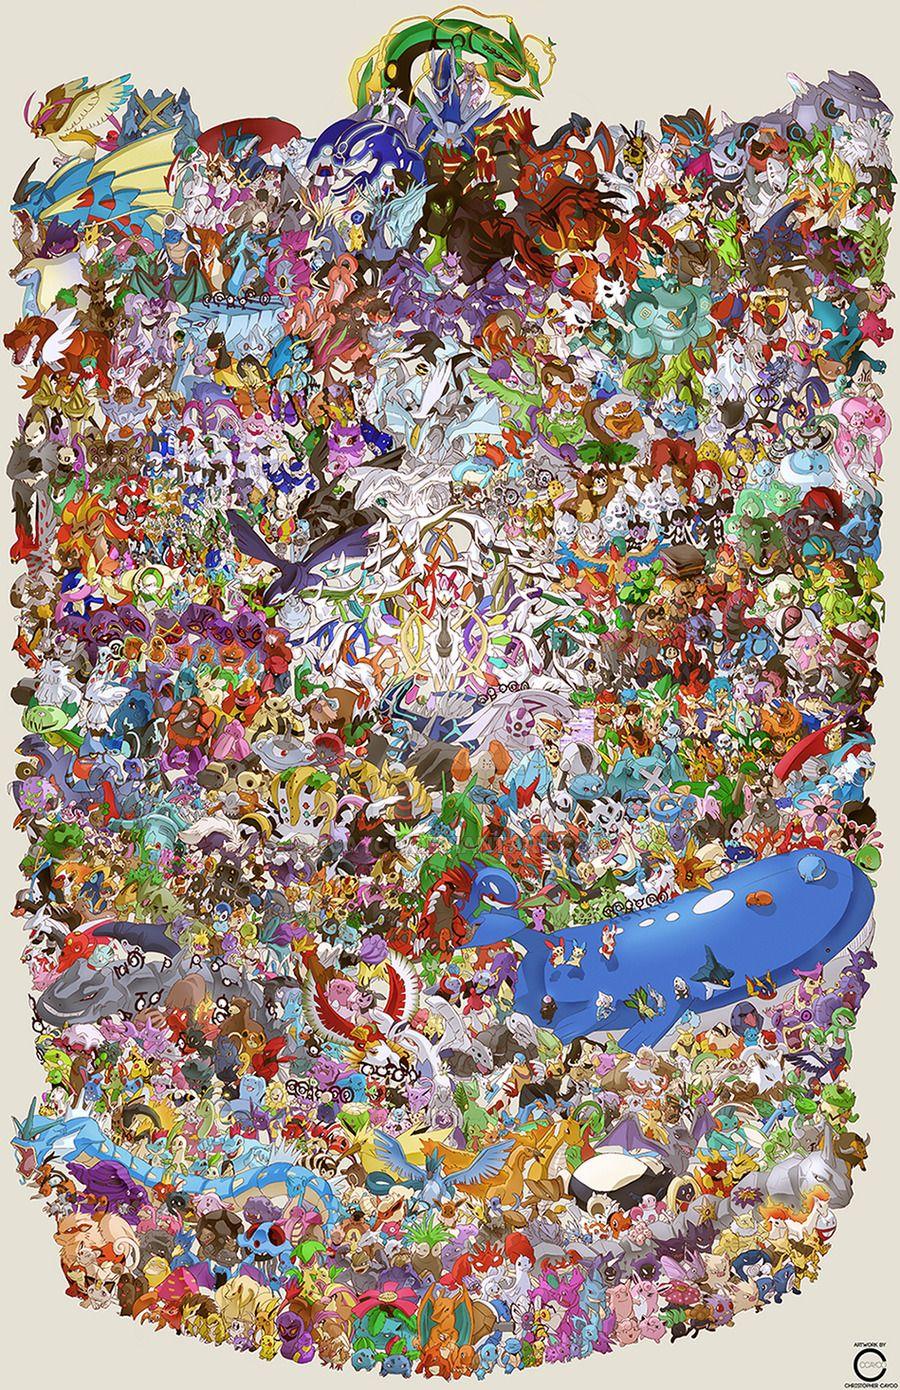 http://kotaku.com/721-pokemon-21-days-